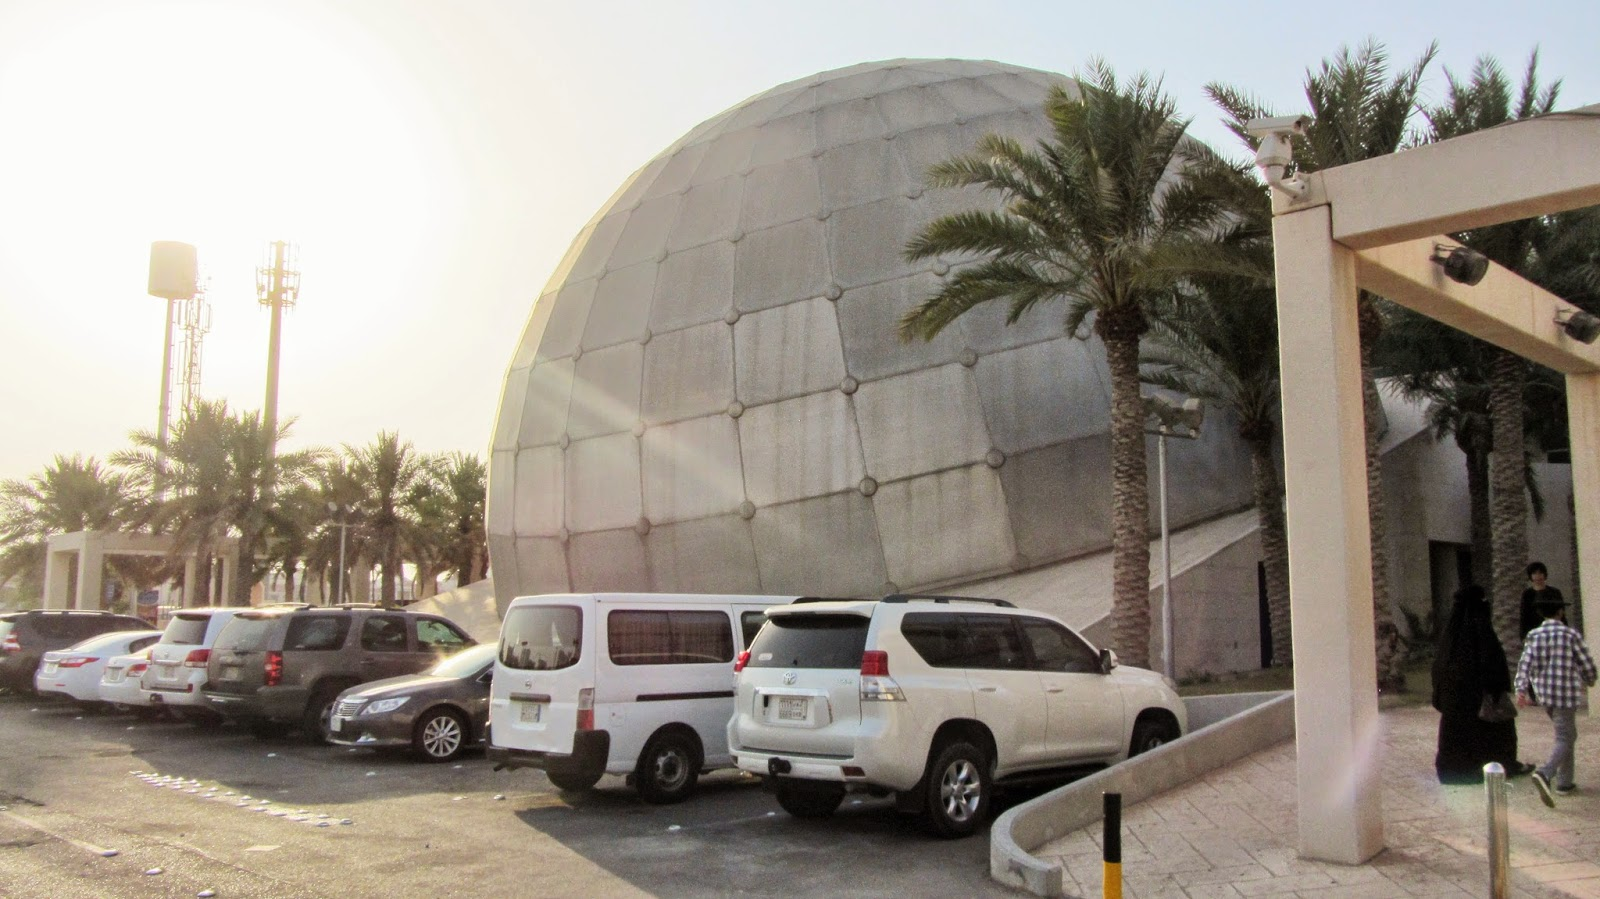 Scitech Al-Khobar Saudi Arabia IMAX theater blog